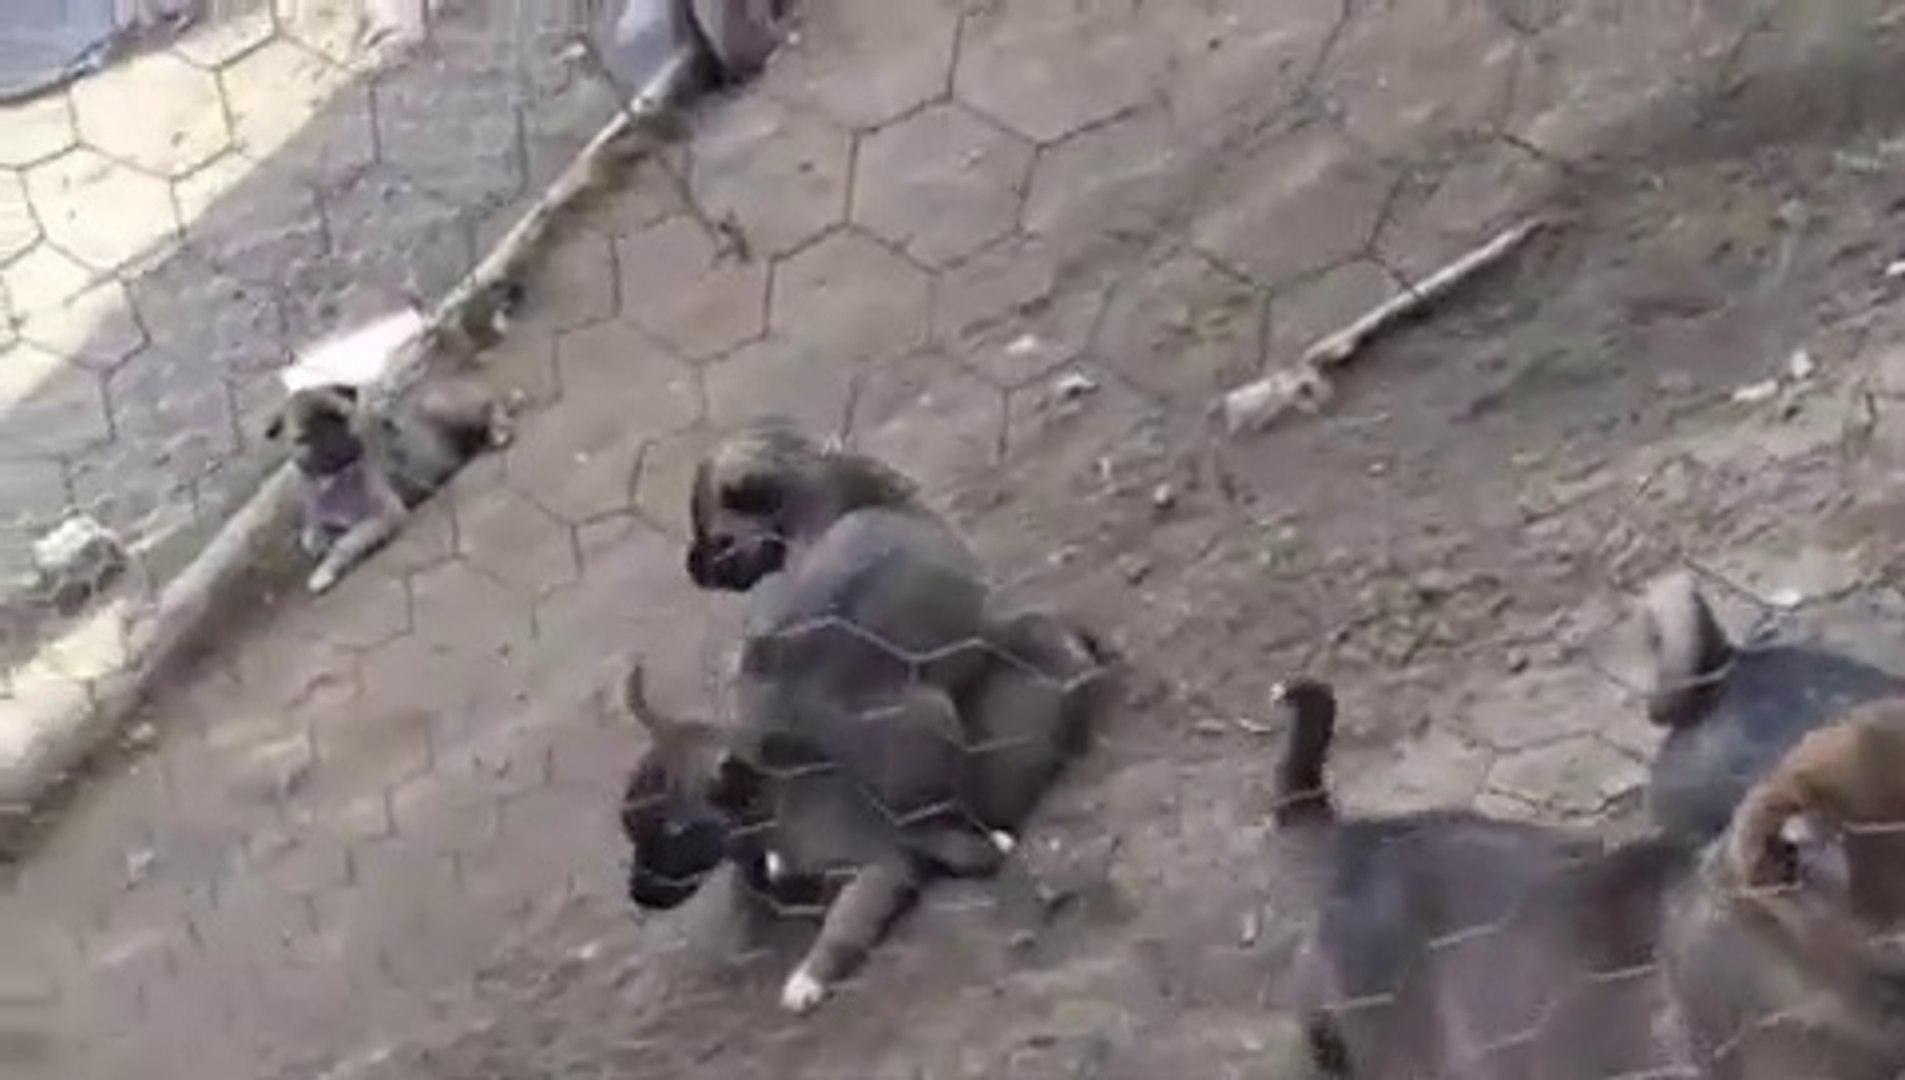 SiVAS KANGAL KOPEK YAVRULARI KURT ALISTIRMALARI - SiVAS KANGAL DOG PUPPiES